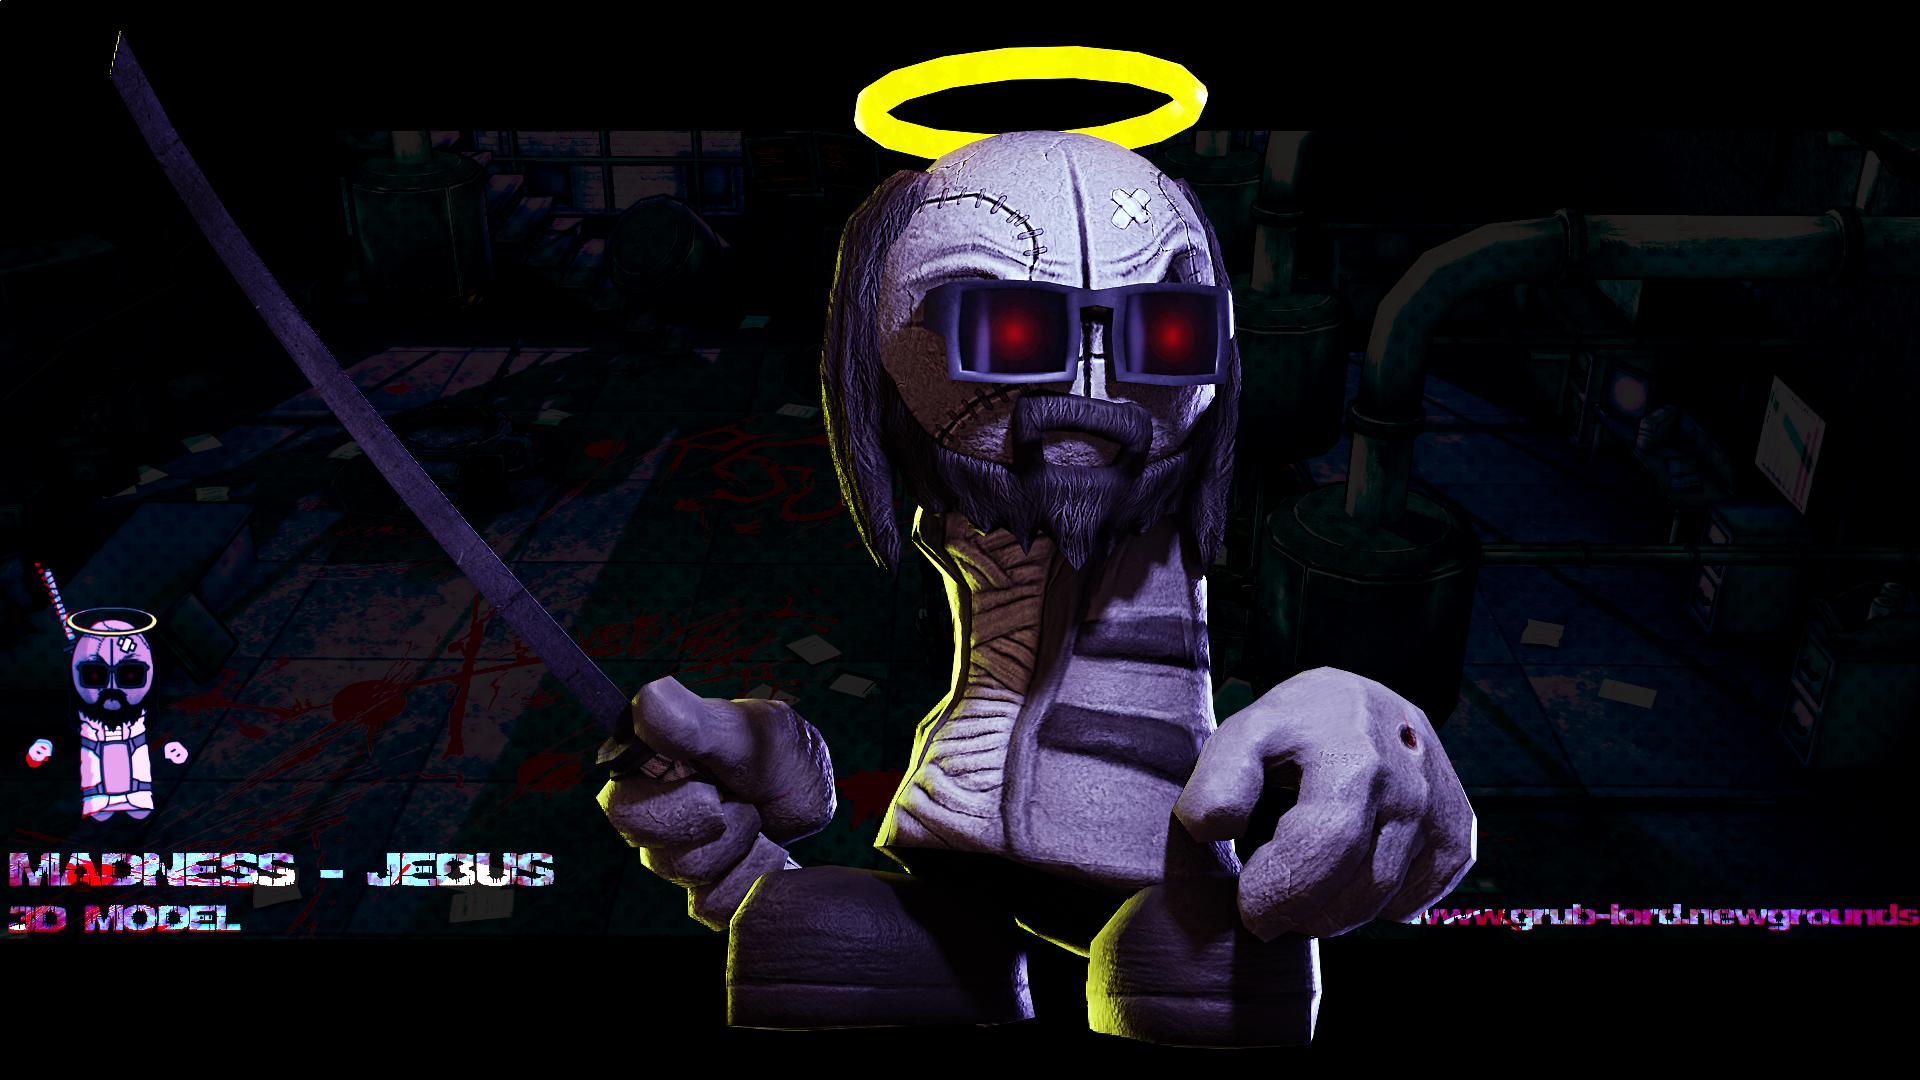 MADNESS - JEBUS 3D